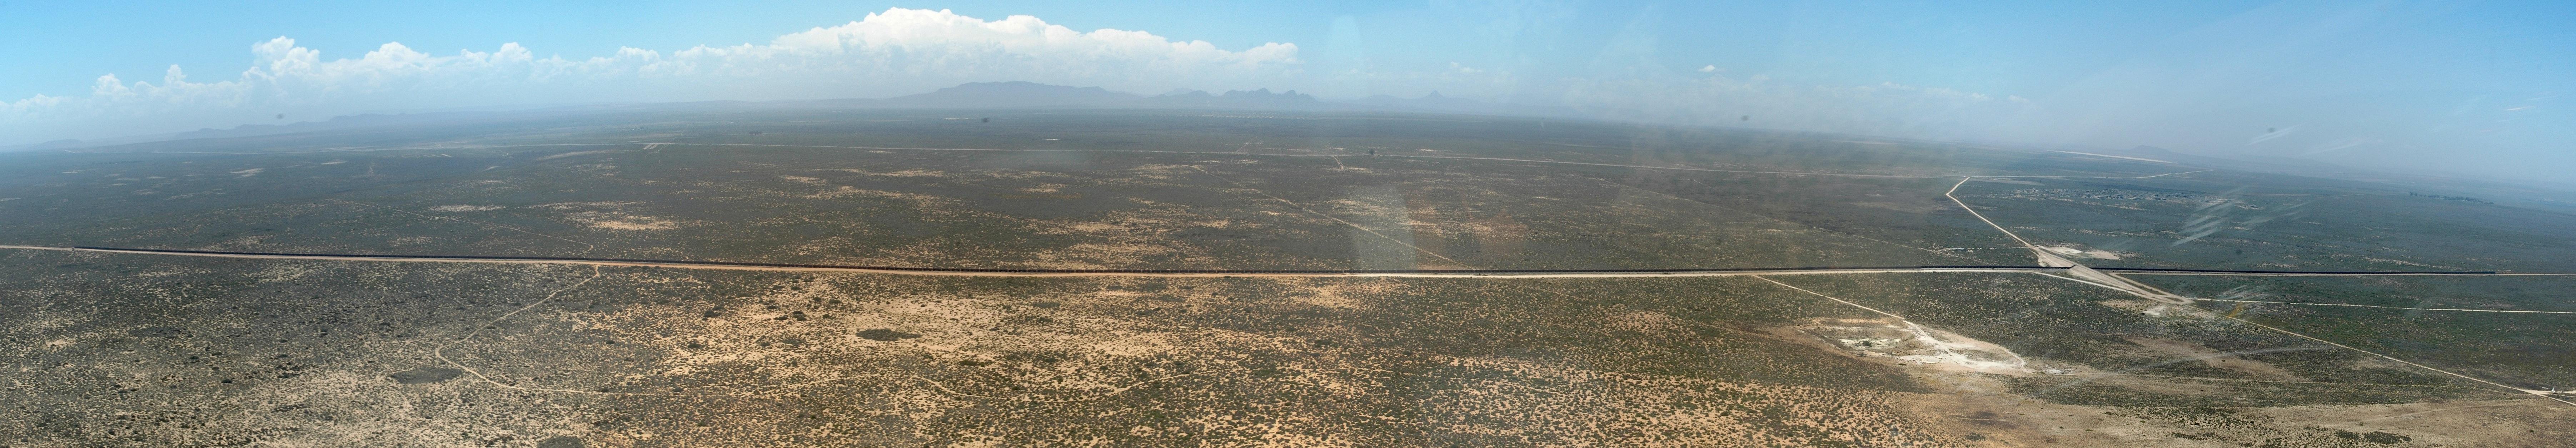 Freight in Africa - Sishen Saldanha Line  - 860 km